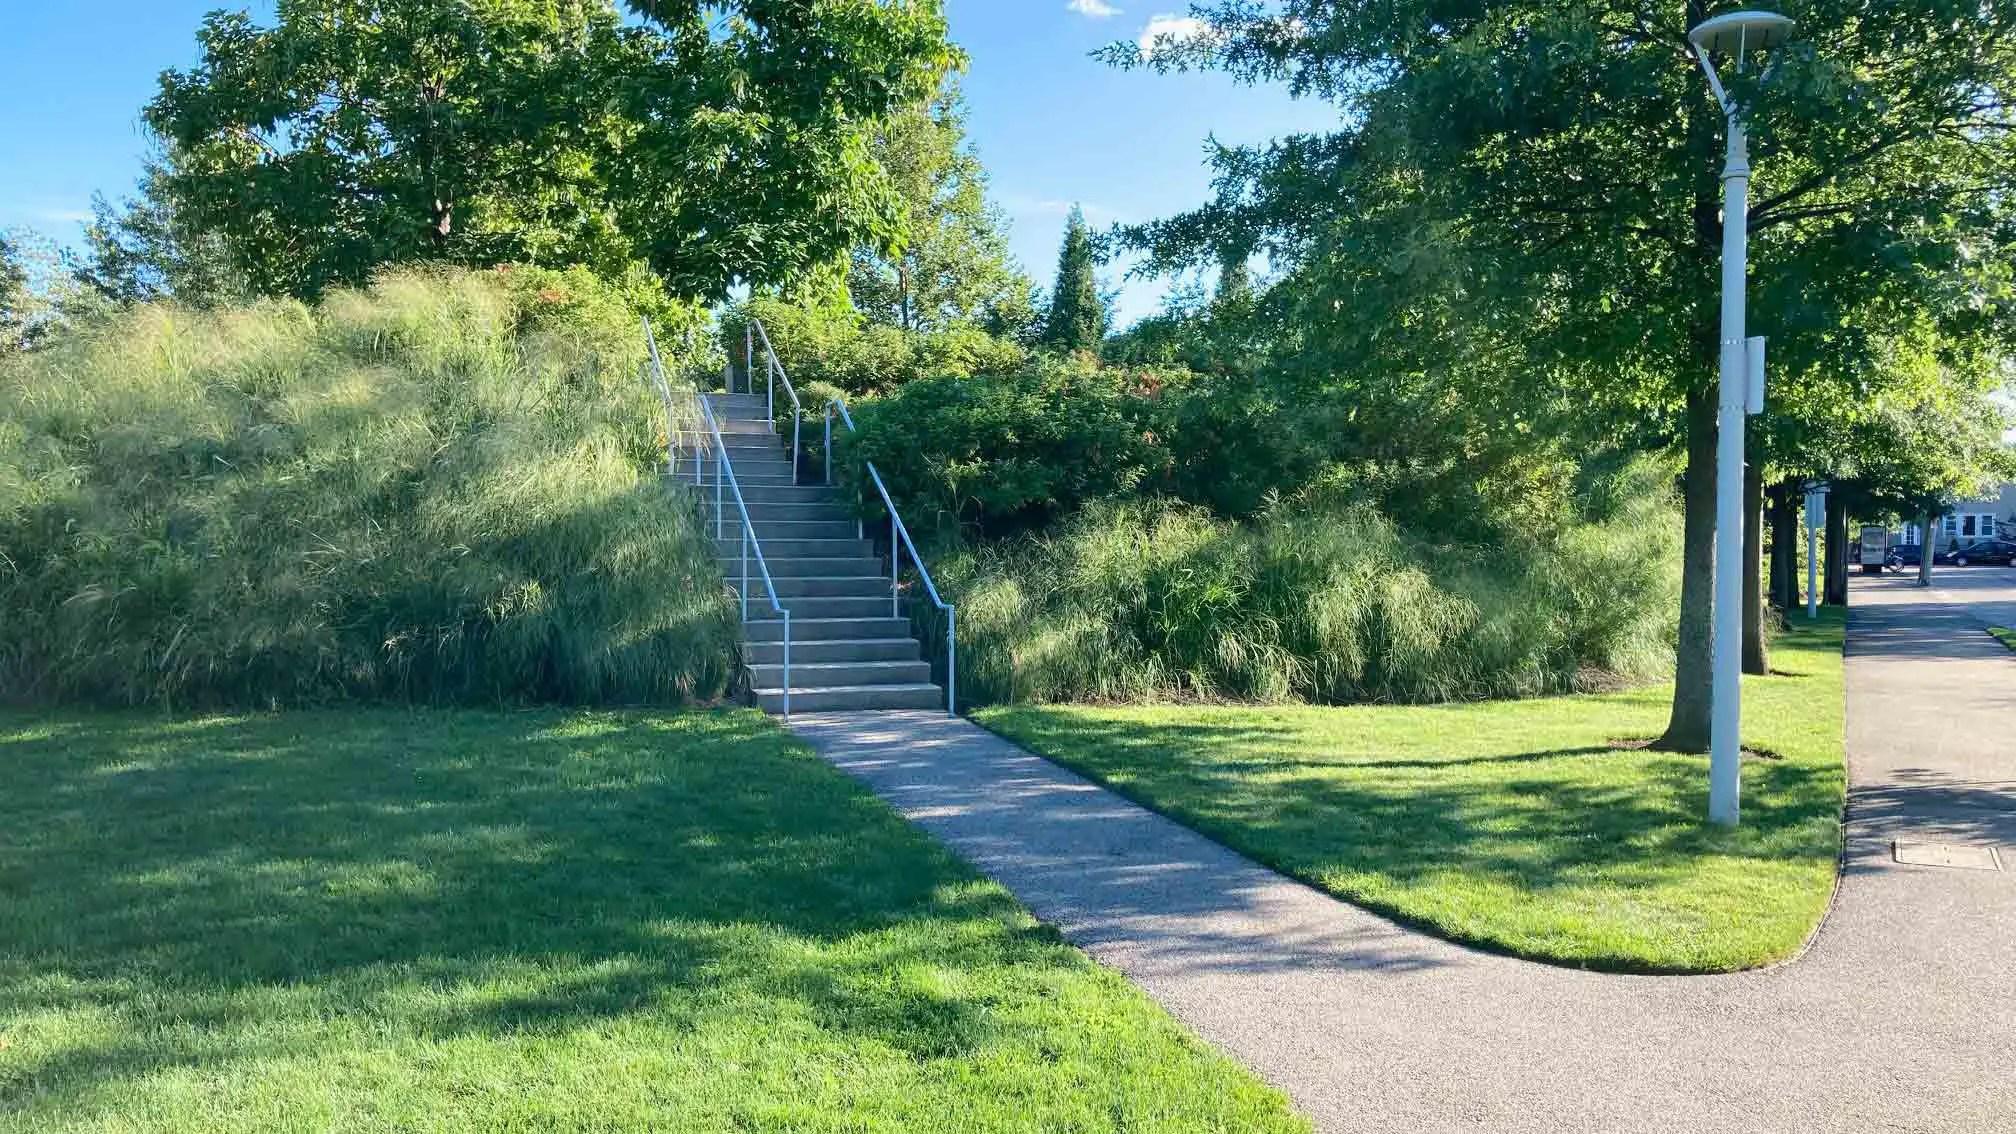 raymond mellone park allston